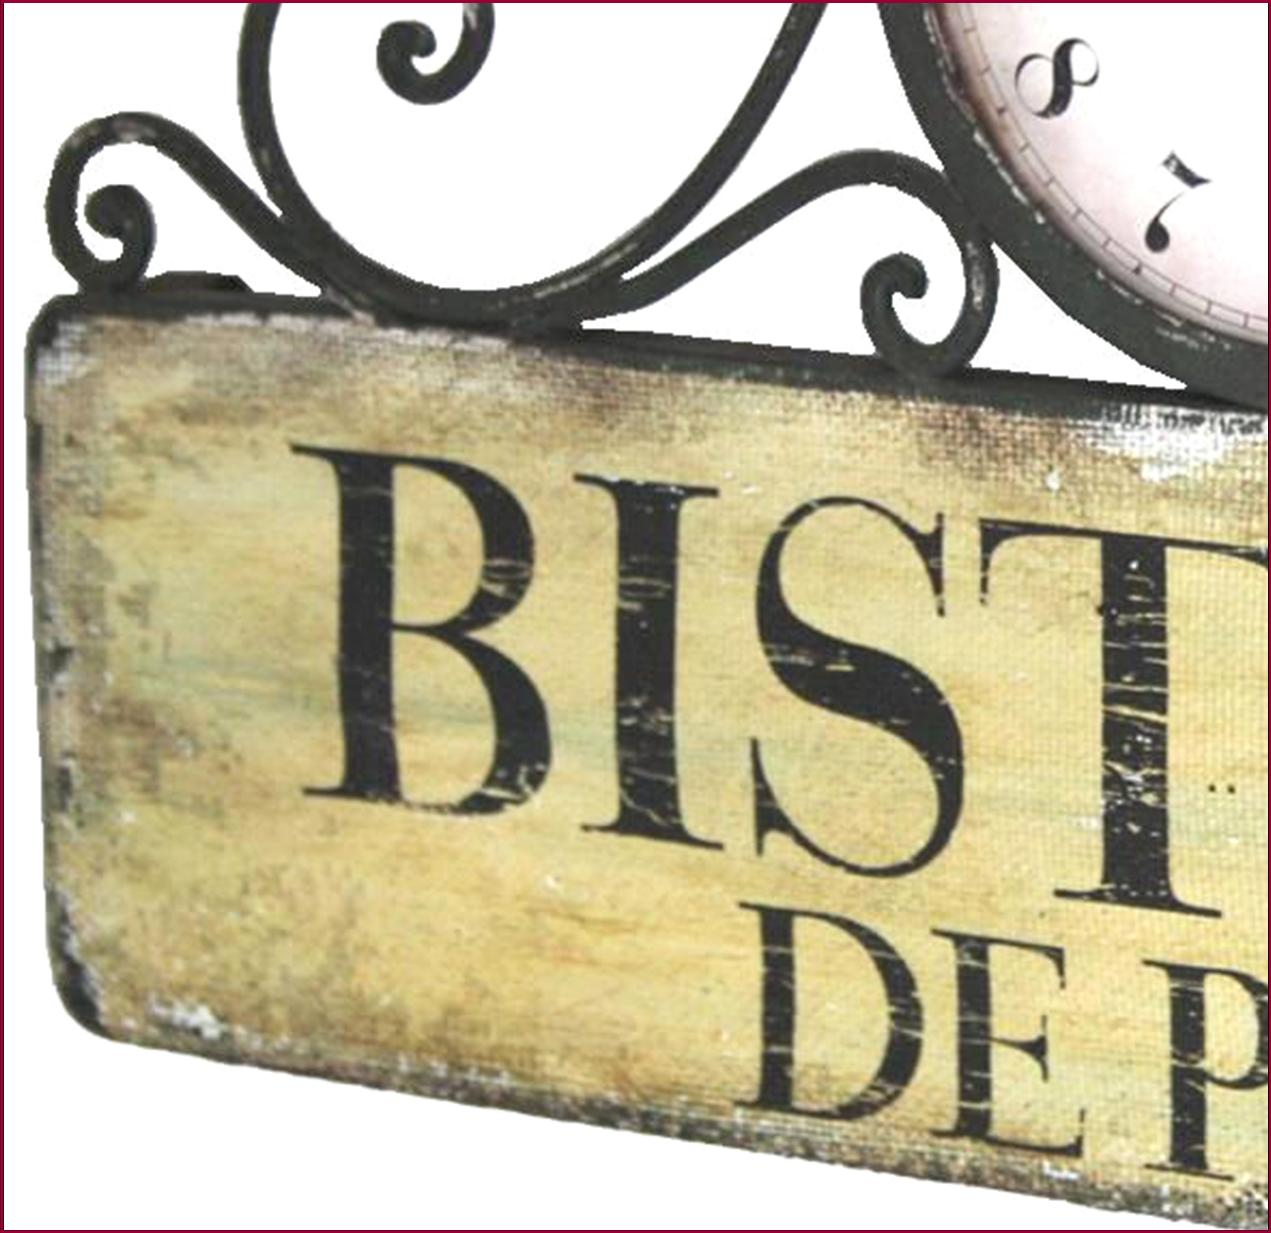 Style ancienne horloge de gare cuisine salon bar d entr e bistrot 48cm murale for Horloge murale style bistrot